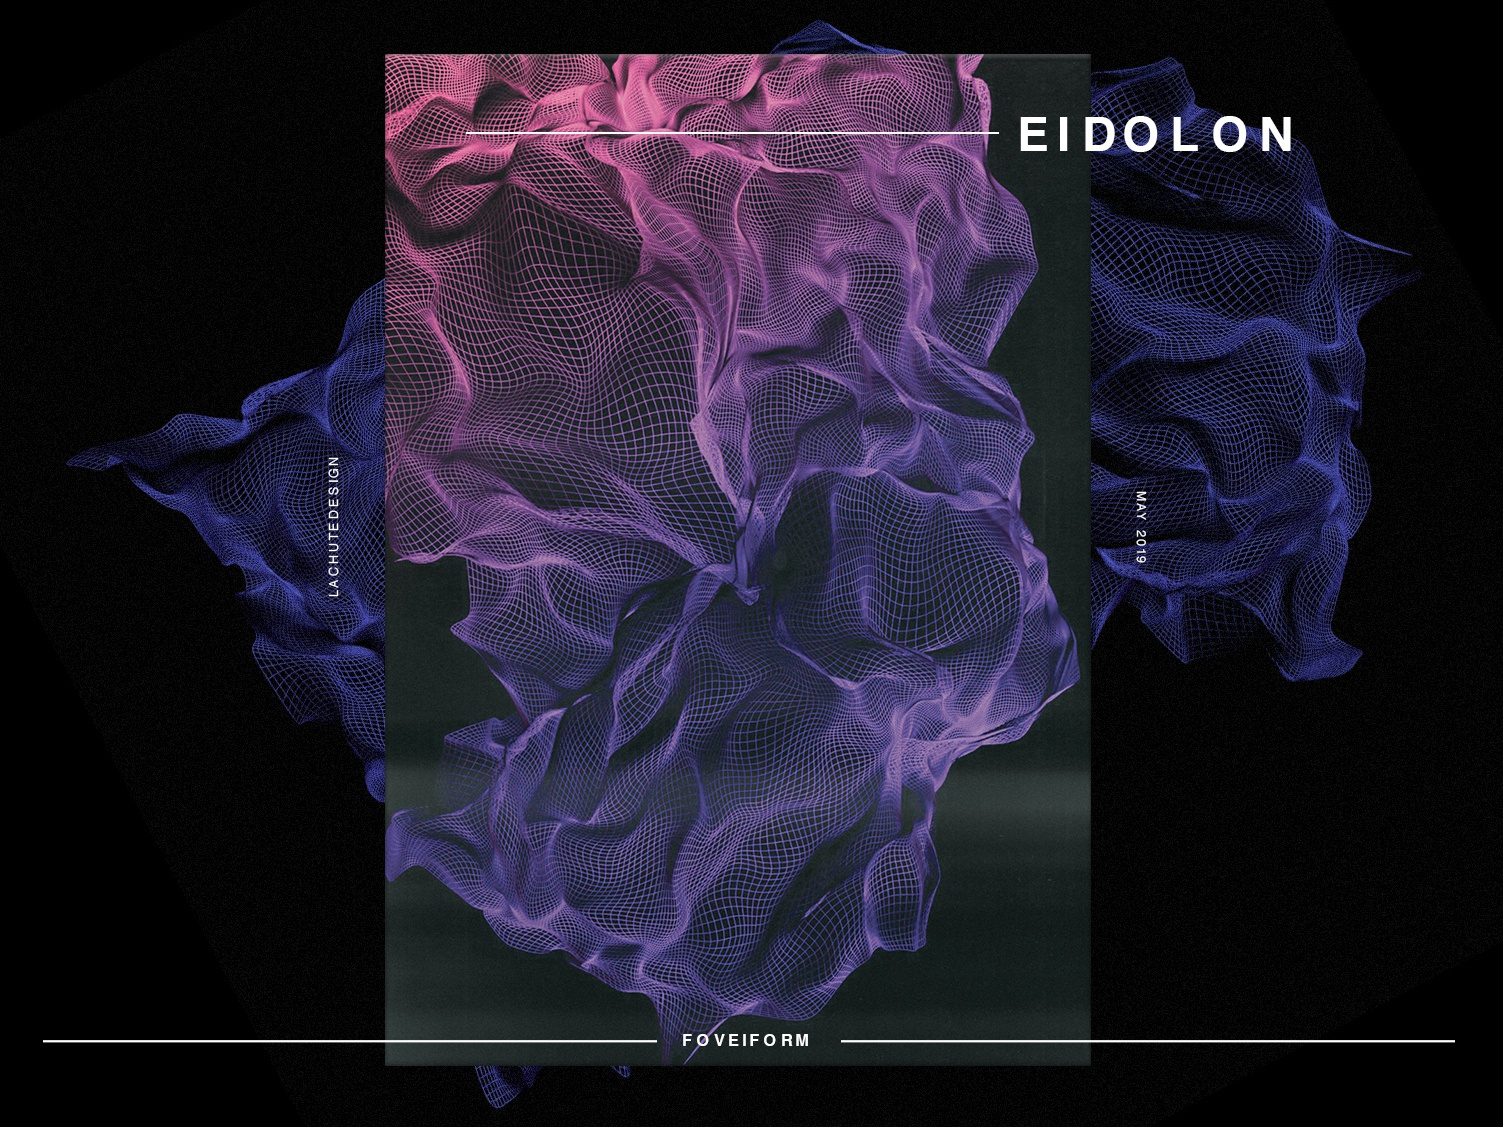 EIDOLON - FOVEIFORM photoshop blender3d 3d art 3d eidolon wireframe space light geometry gradiant abstract album cover design album cover album artwork album art album color illustration design lachute